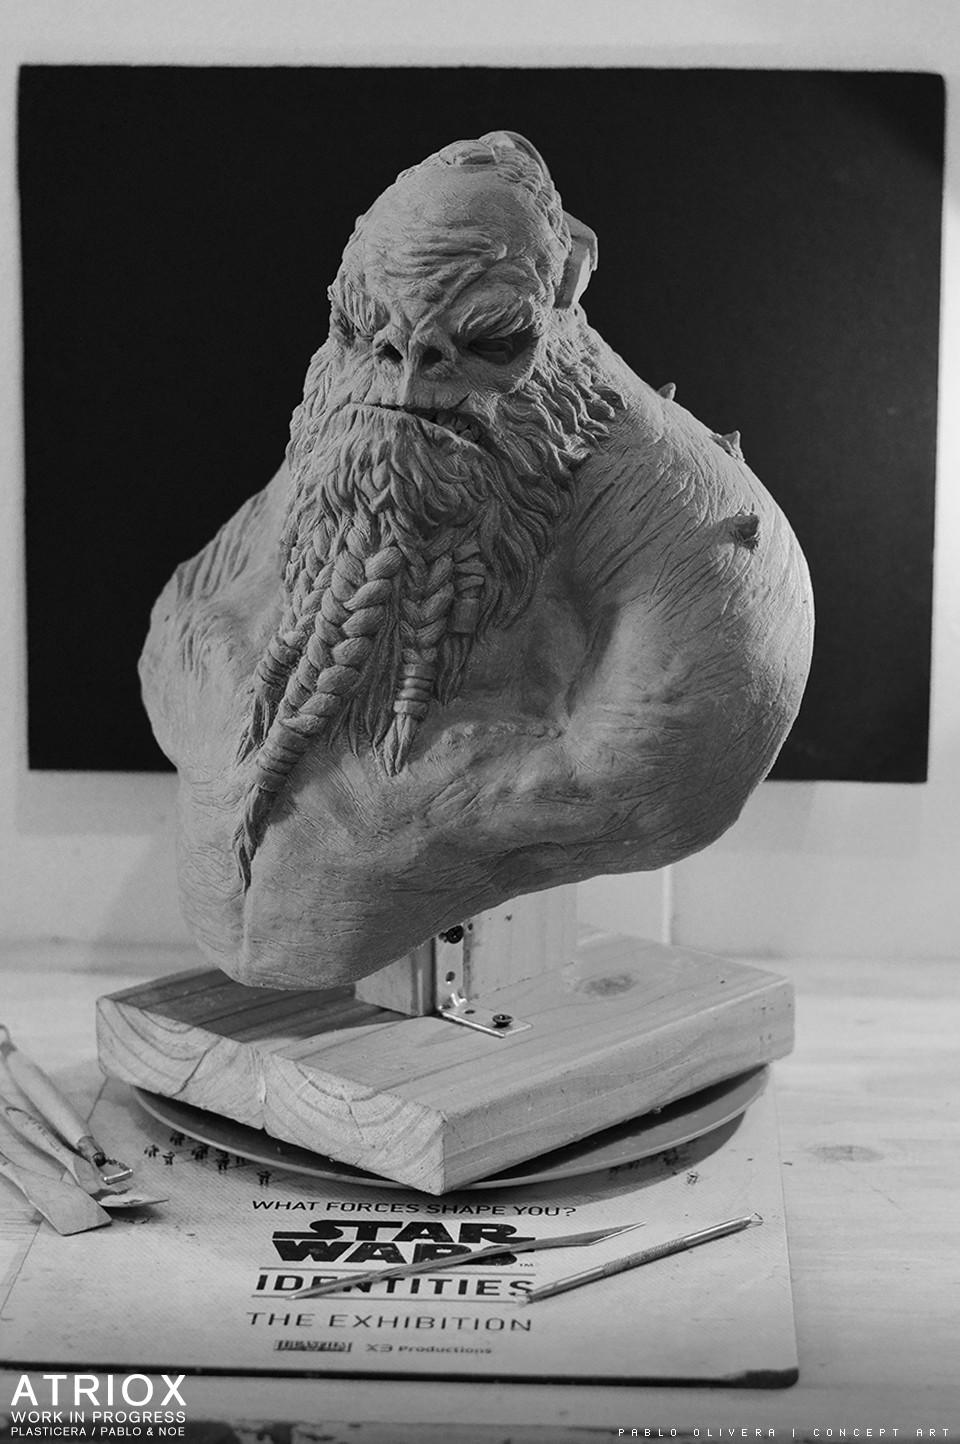 Pablo olivera atriox sculpture plasticera by pablo olivera 02